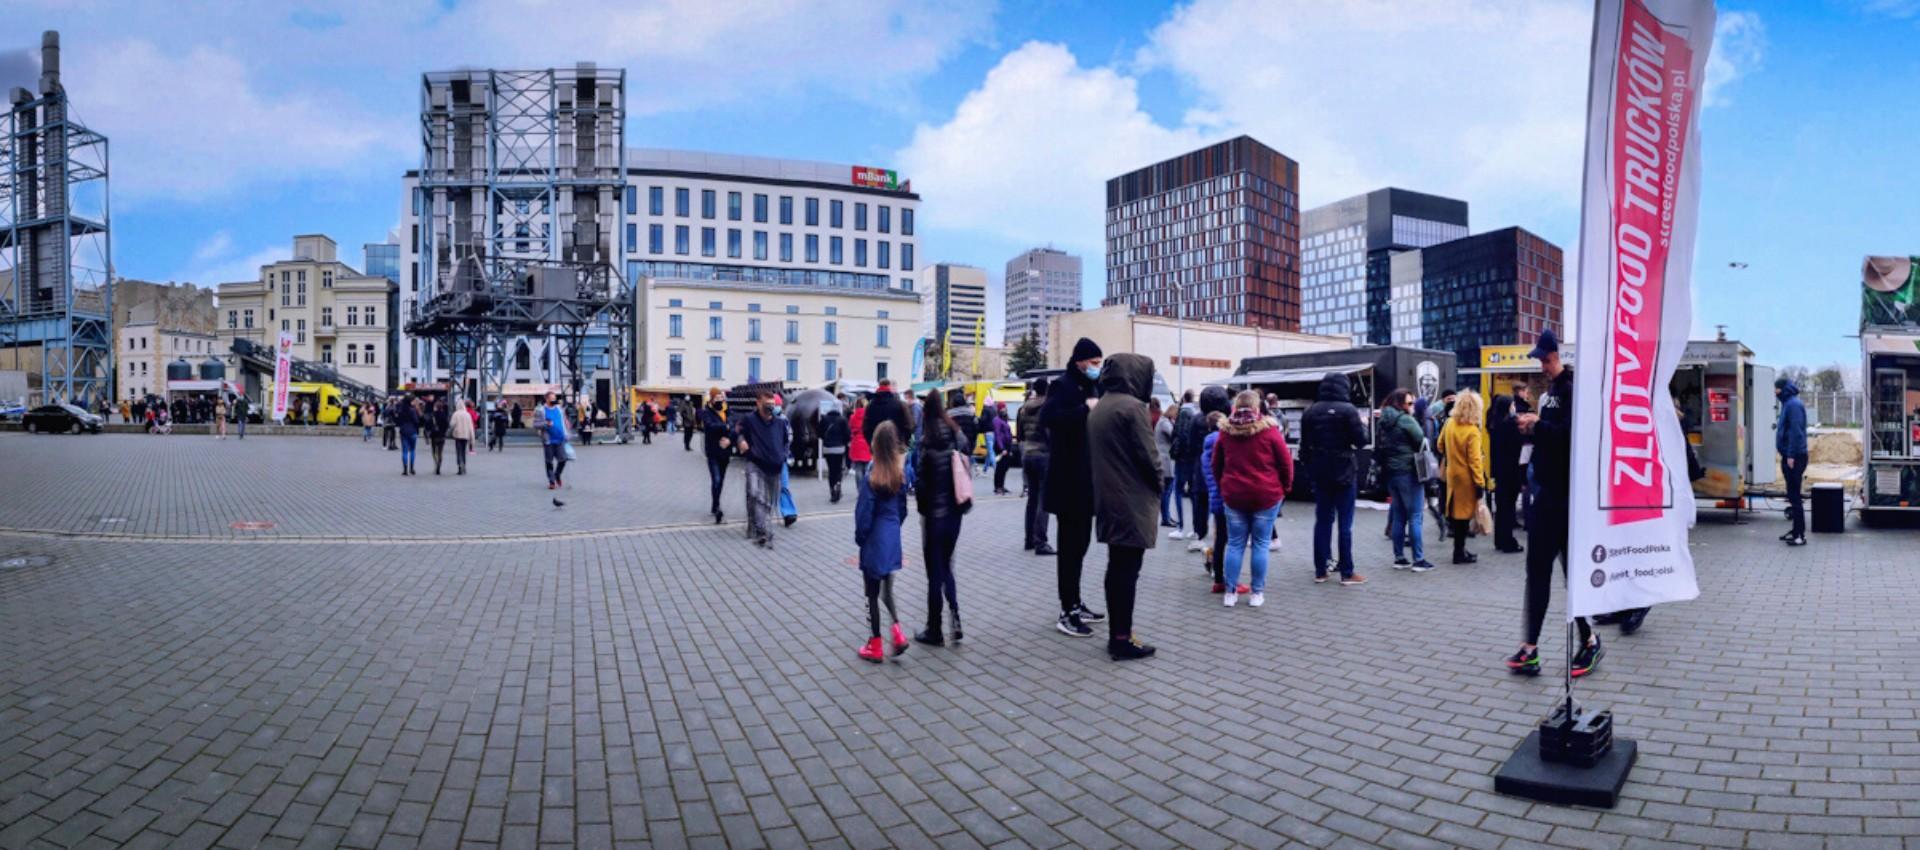 Street Food Festival powraca do EC1